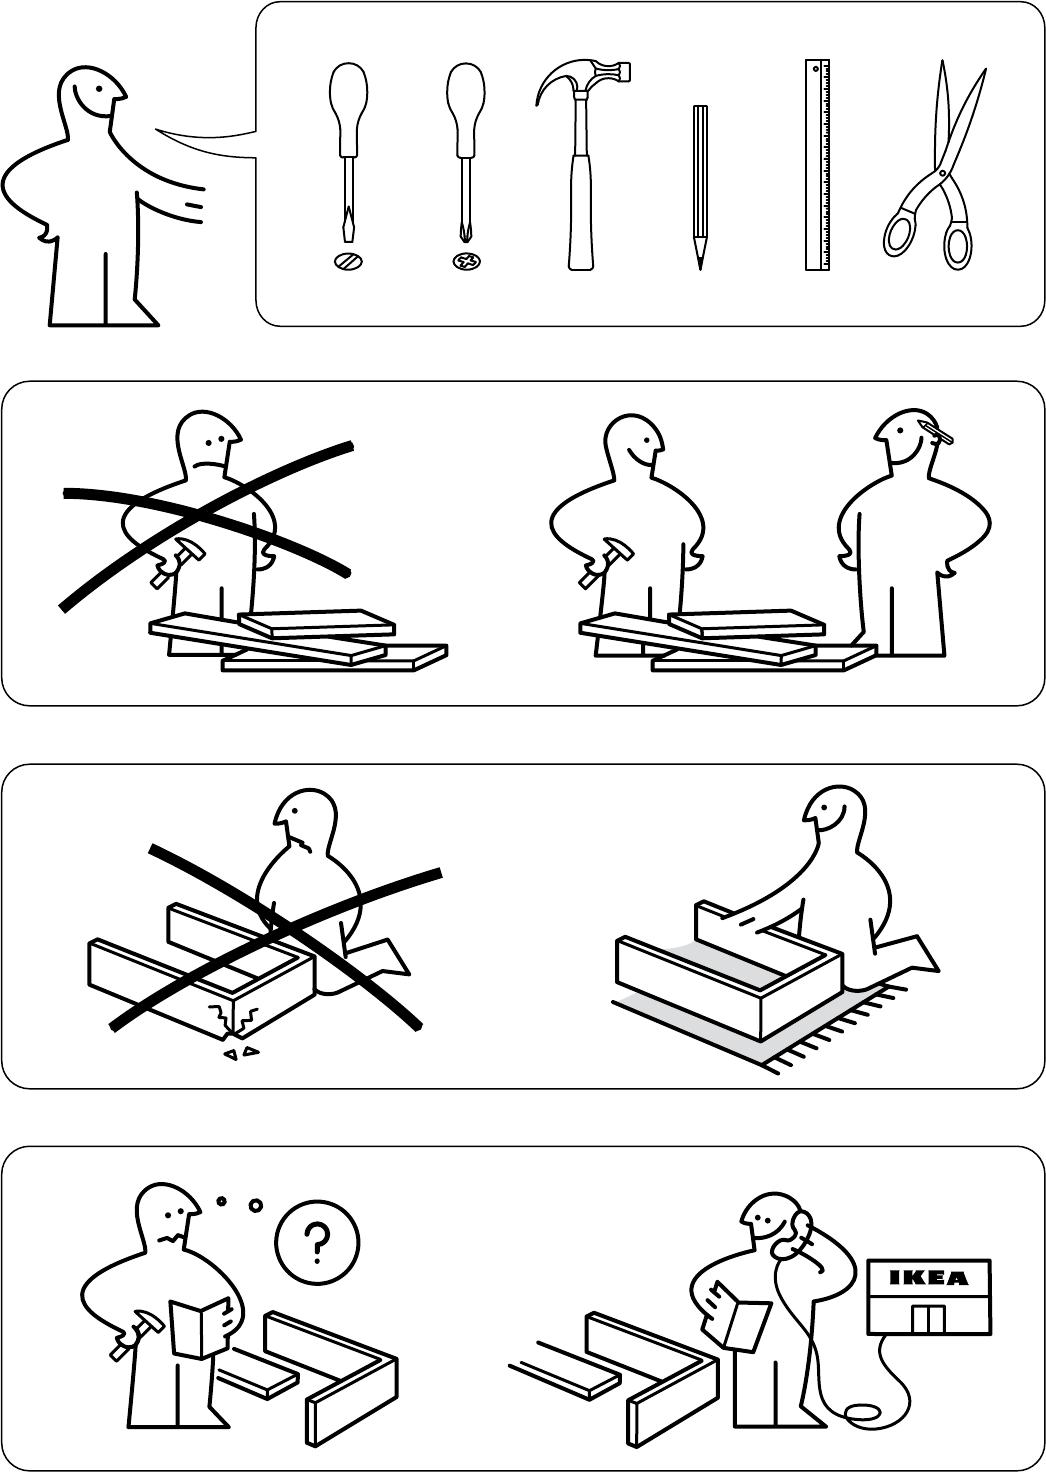 Besta Burs Wandkast.Handleiding Ikea Besta Burs Tv Meubel Pagina 1 Van 28 Alle Talen